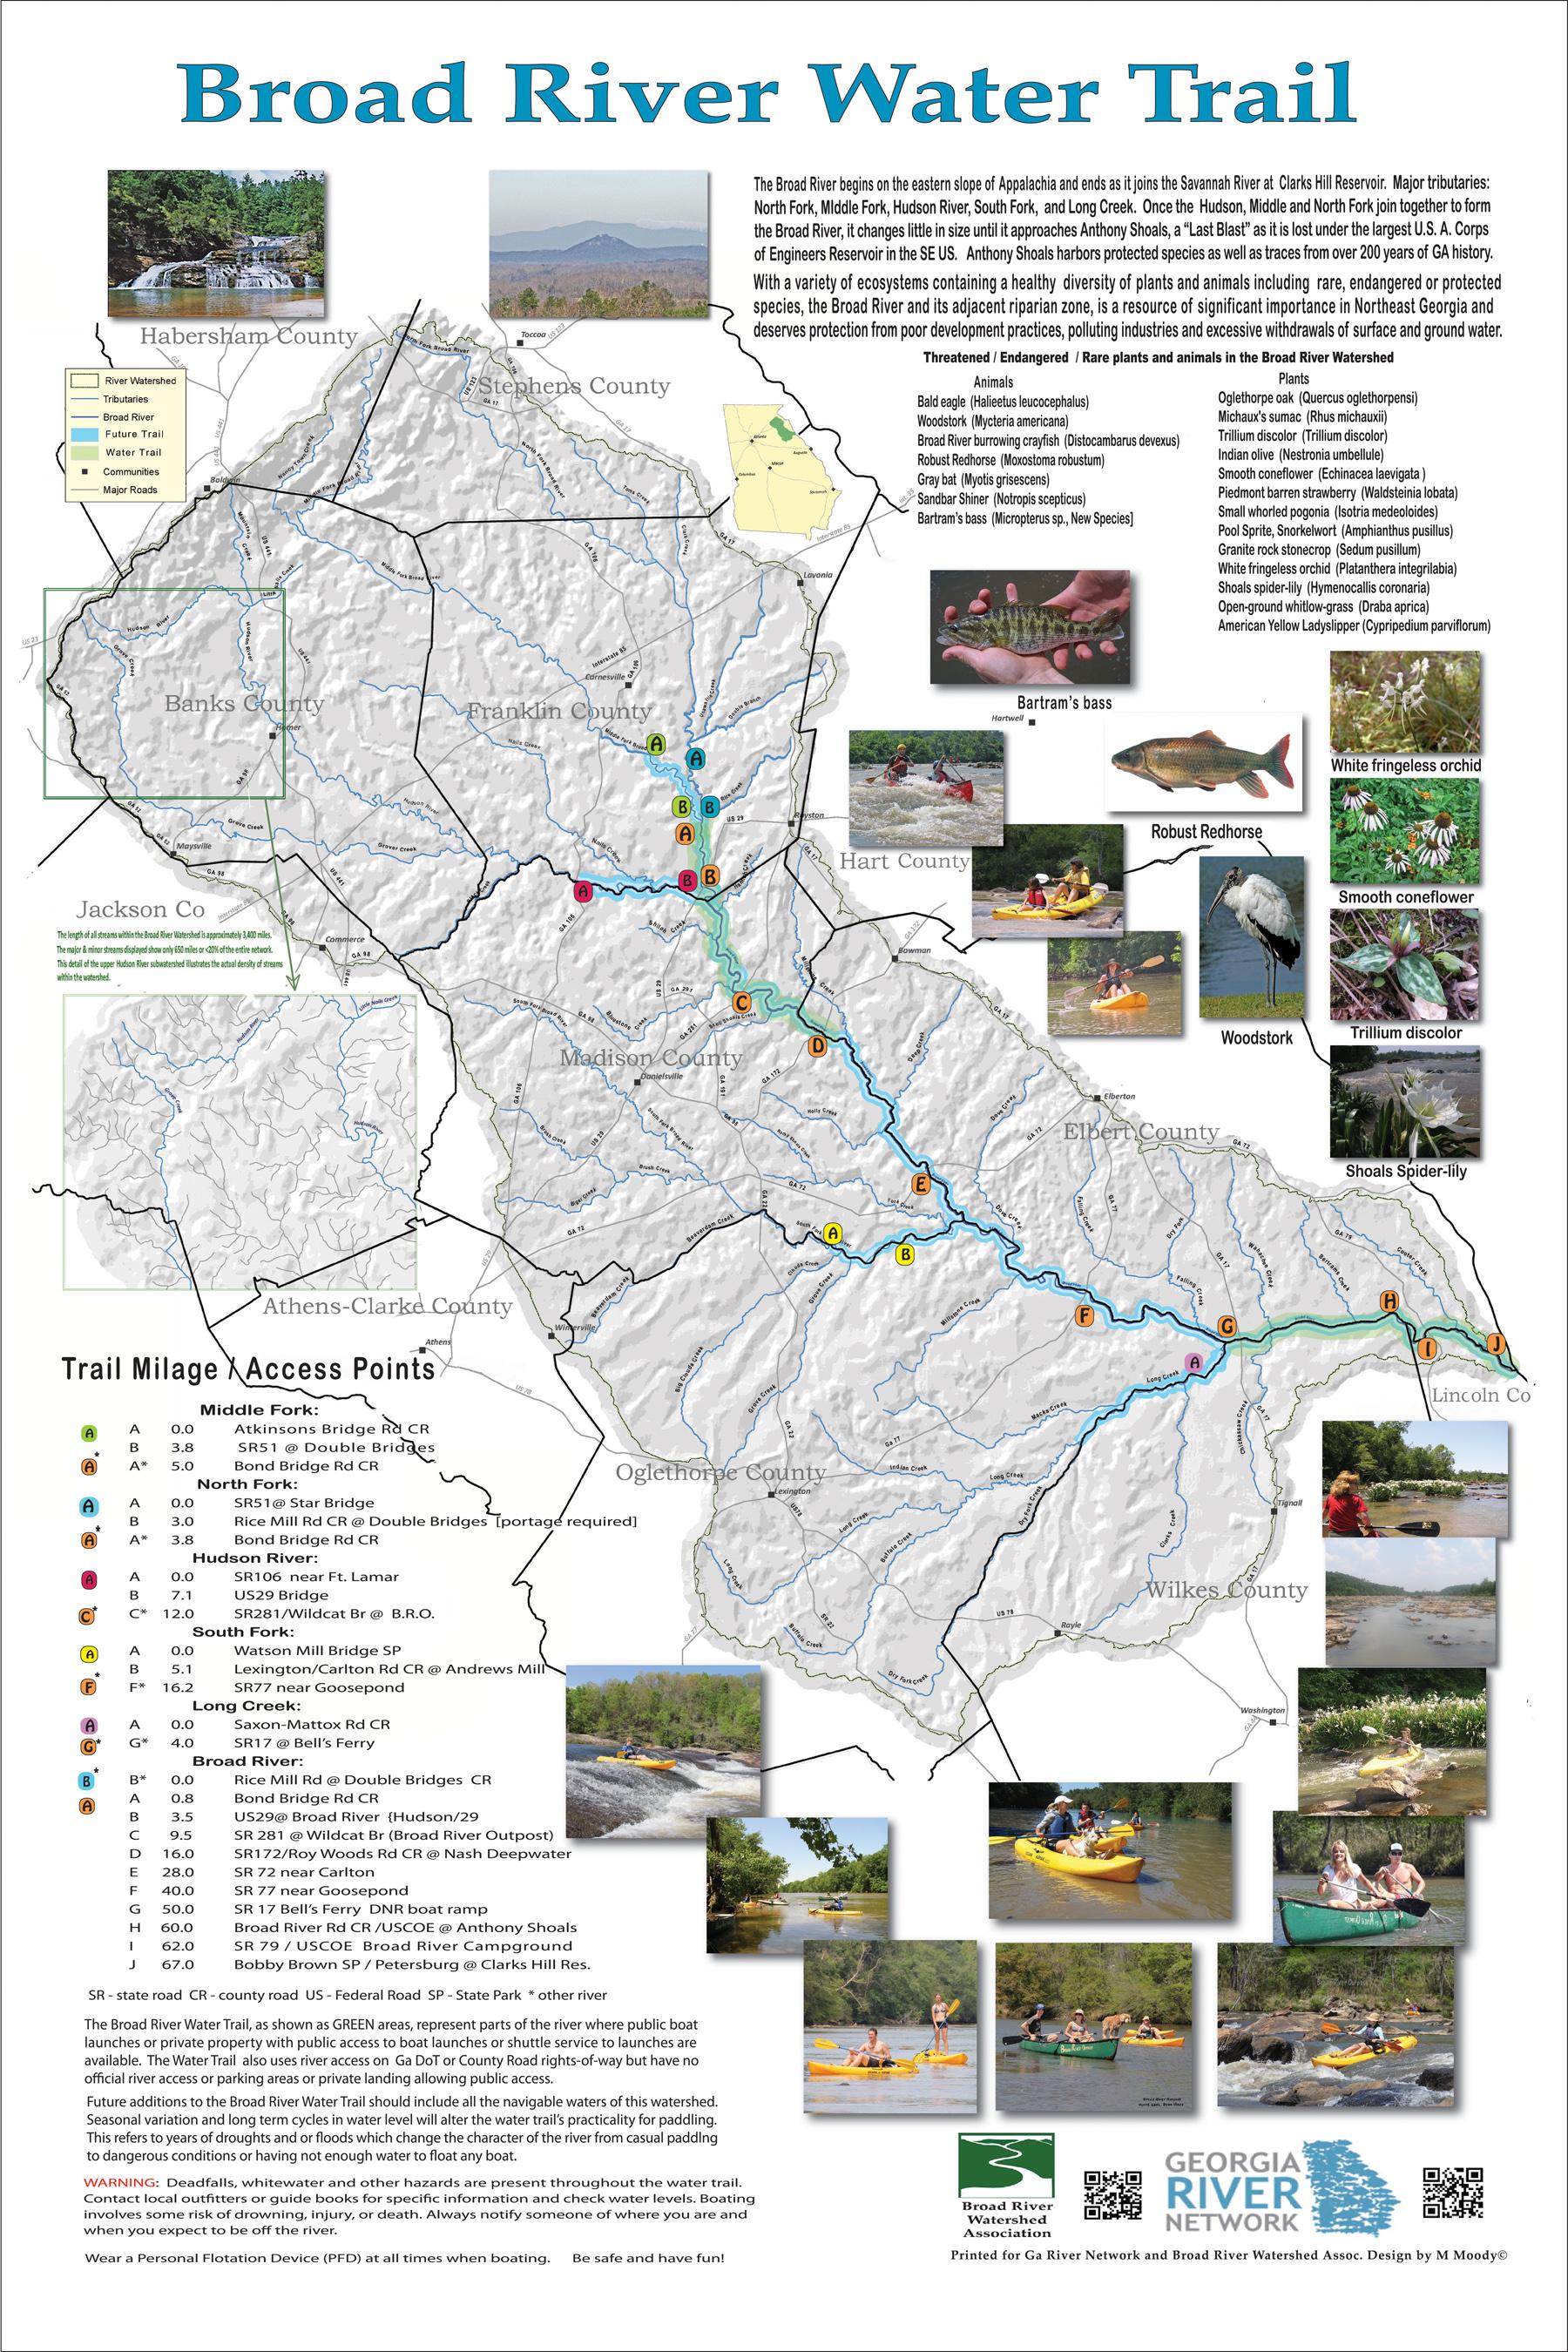 BRWABRWTSmallSizexjpg - Rivers of georgia map